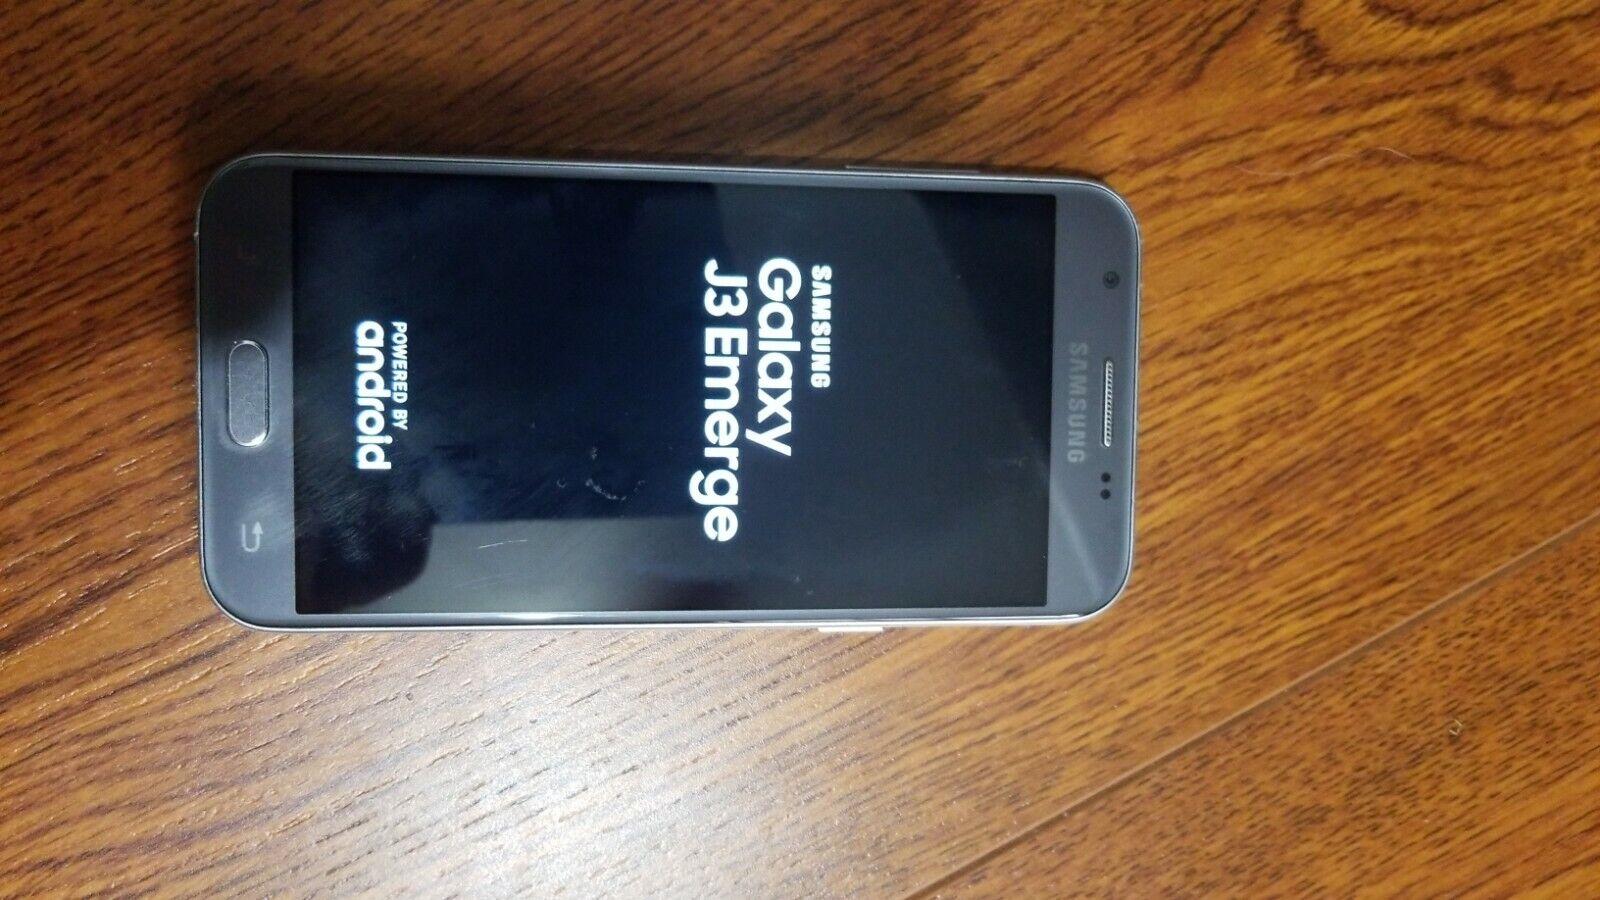 Samsung Galaxy J3 Emerge Sm J327p Sprint Grey Clean Esn For Sale Online Ebay